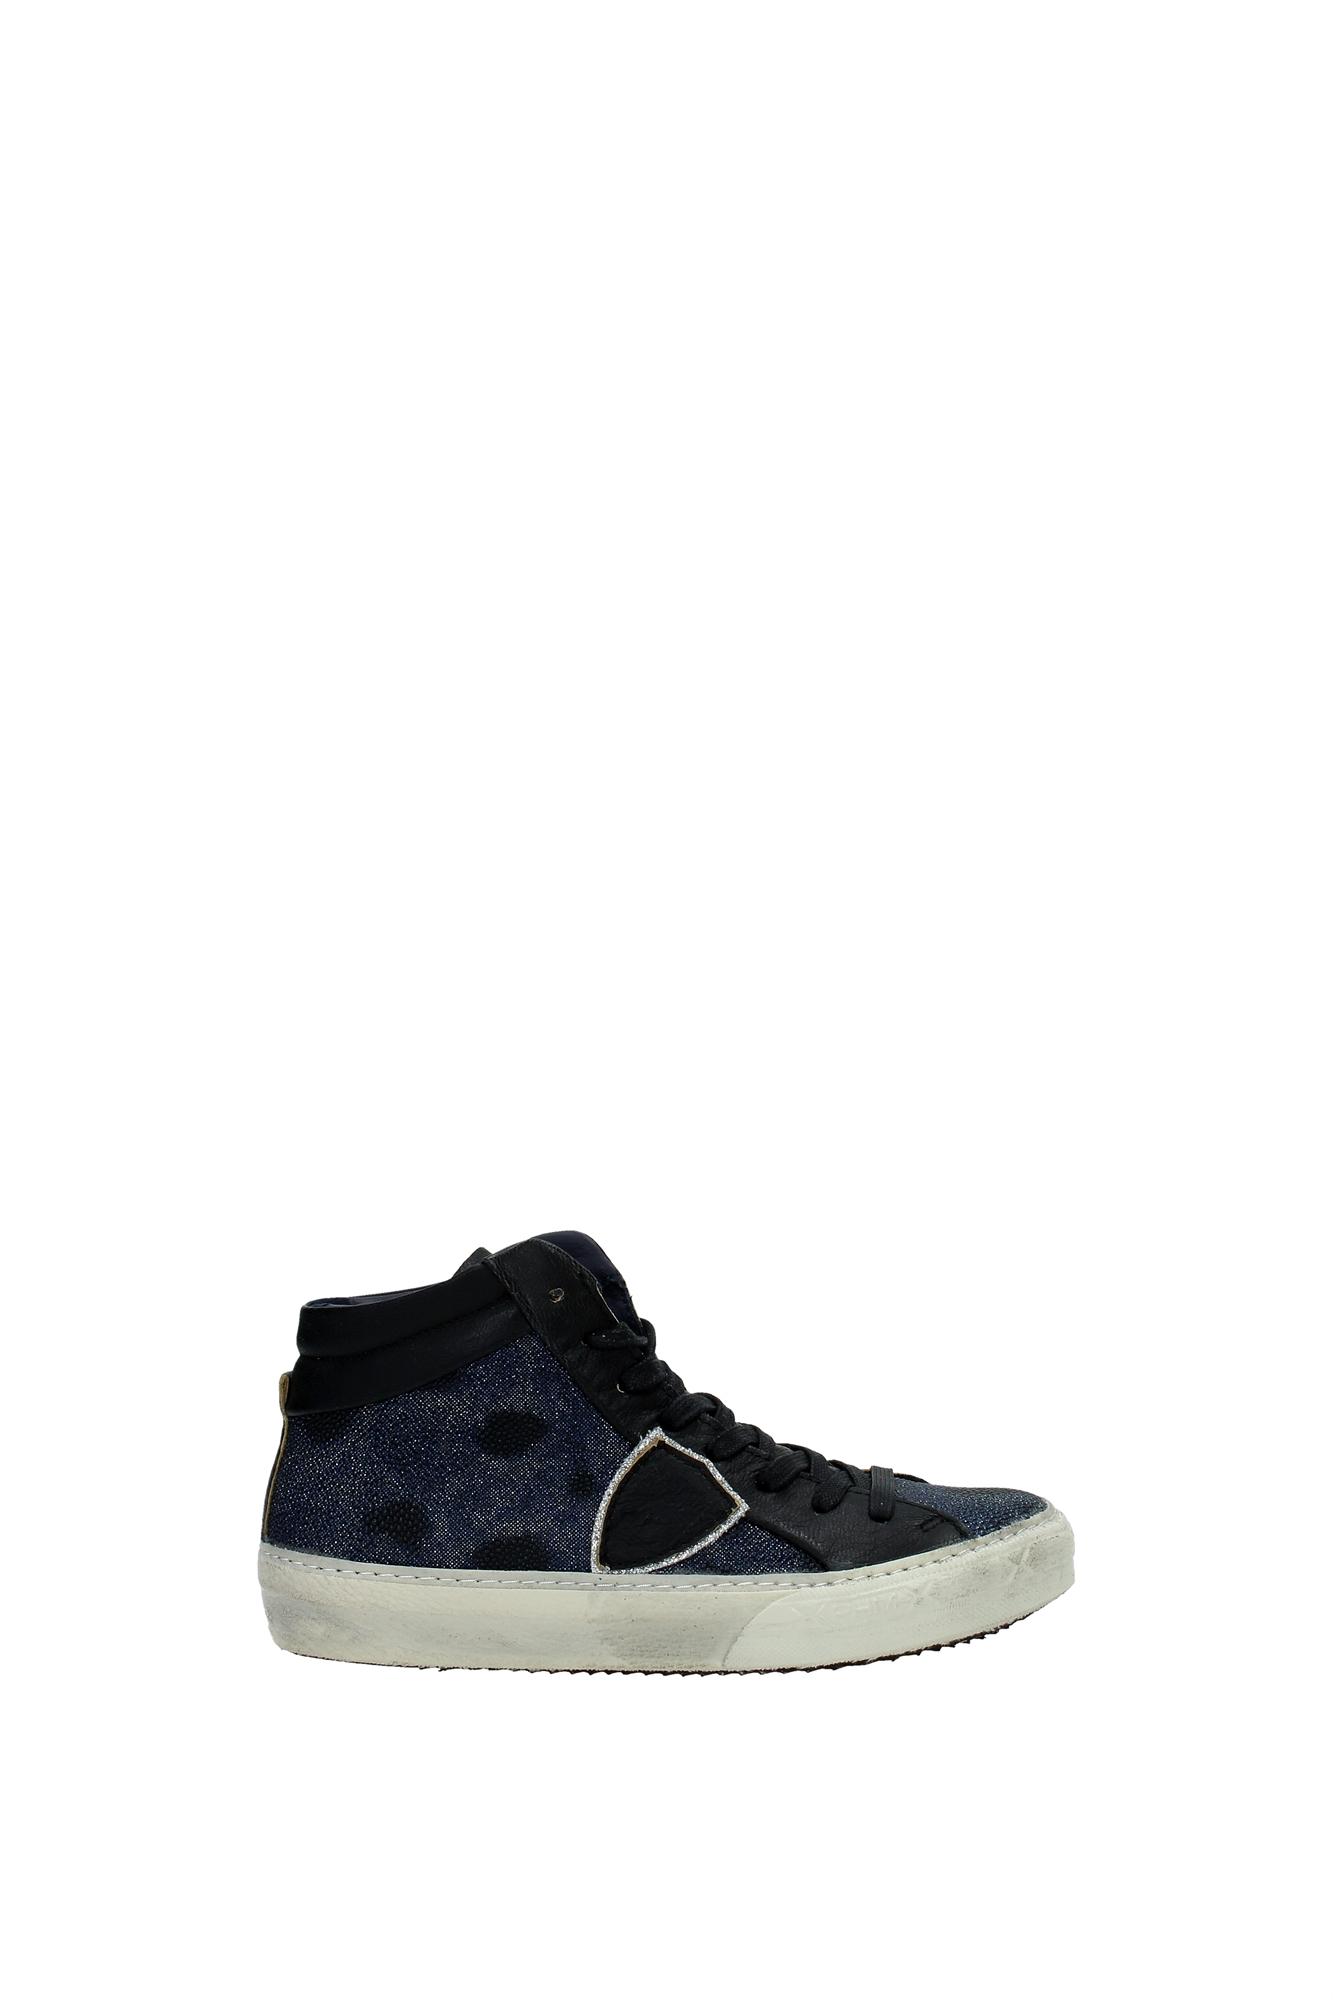 sneakers philippe model damen leder blau mdhdgx01 ebay. Black Bedroom Furniture Sets. Home Design Ideas